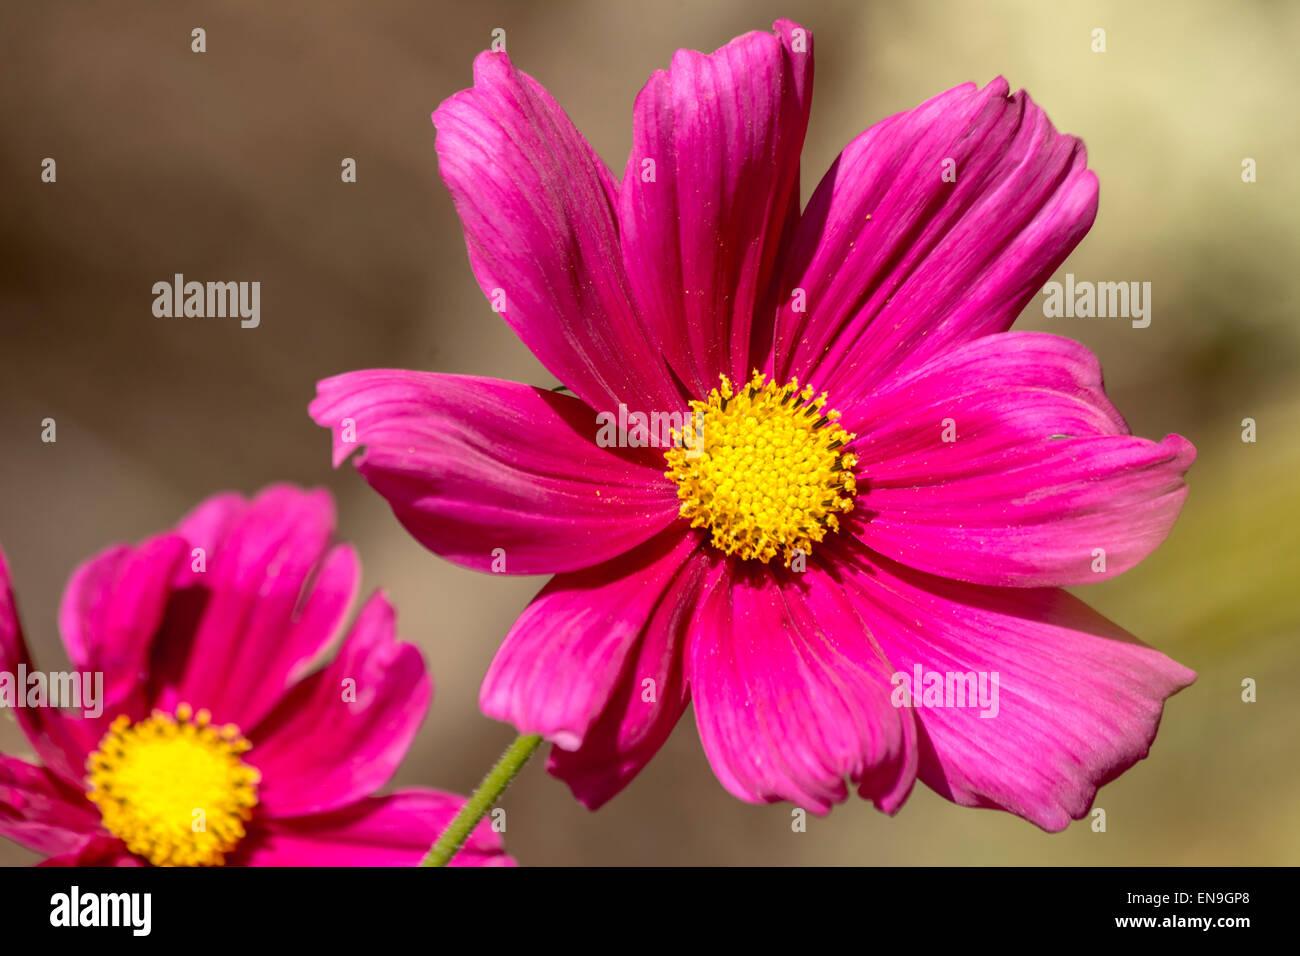 Fully open magenta cosmos bipinnatus (Dazzler) blossoming in Spring under sunlight (close-up photo) - Stock Image